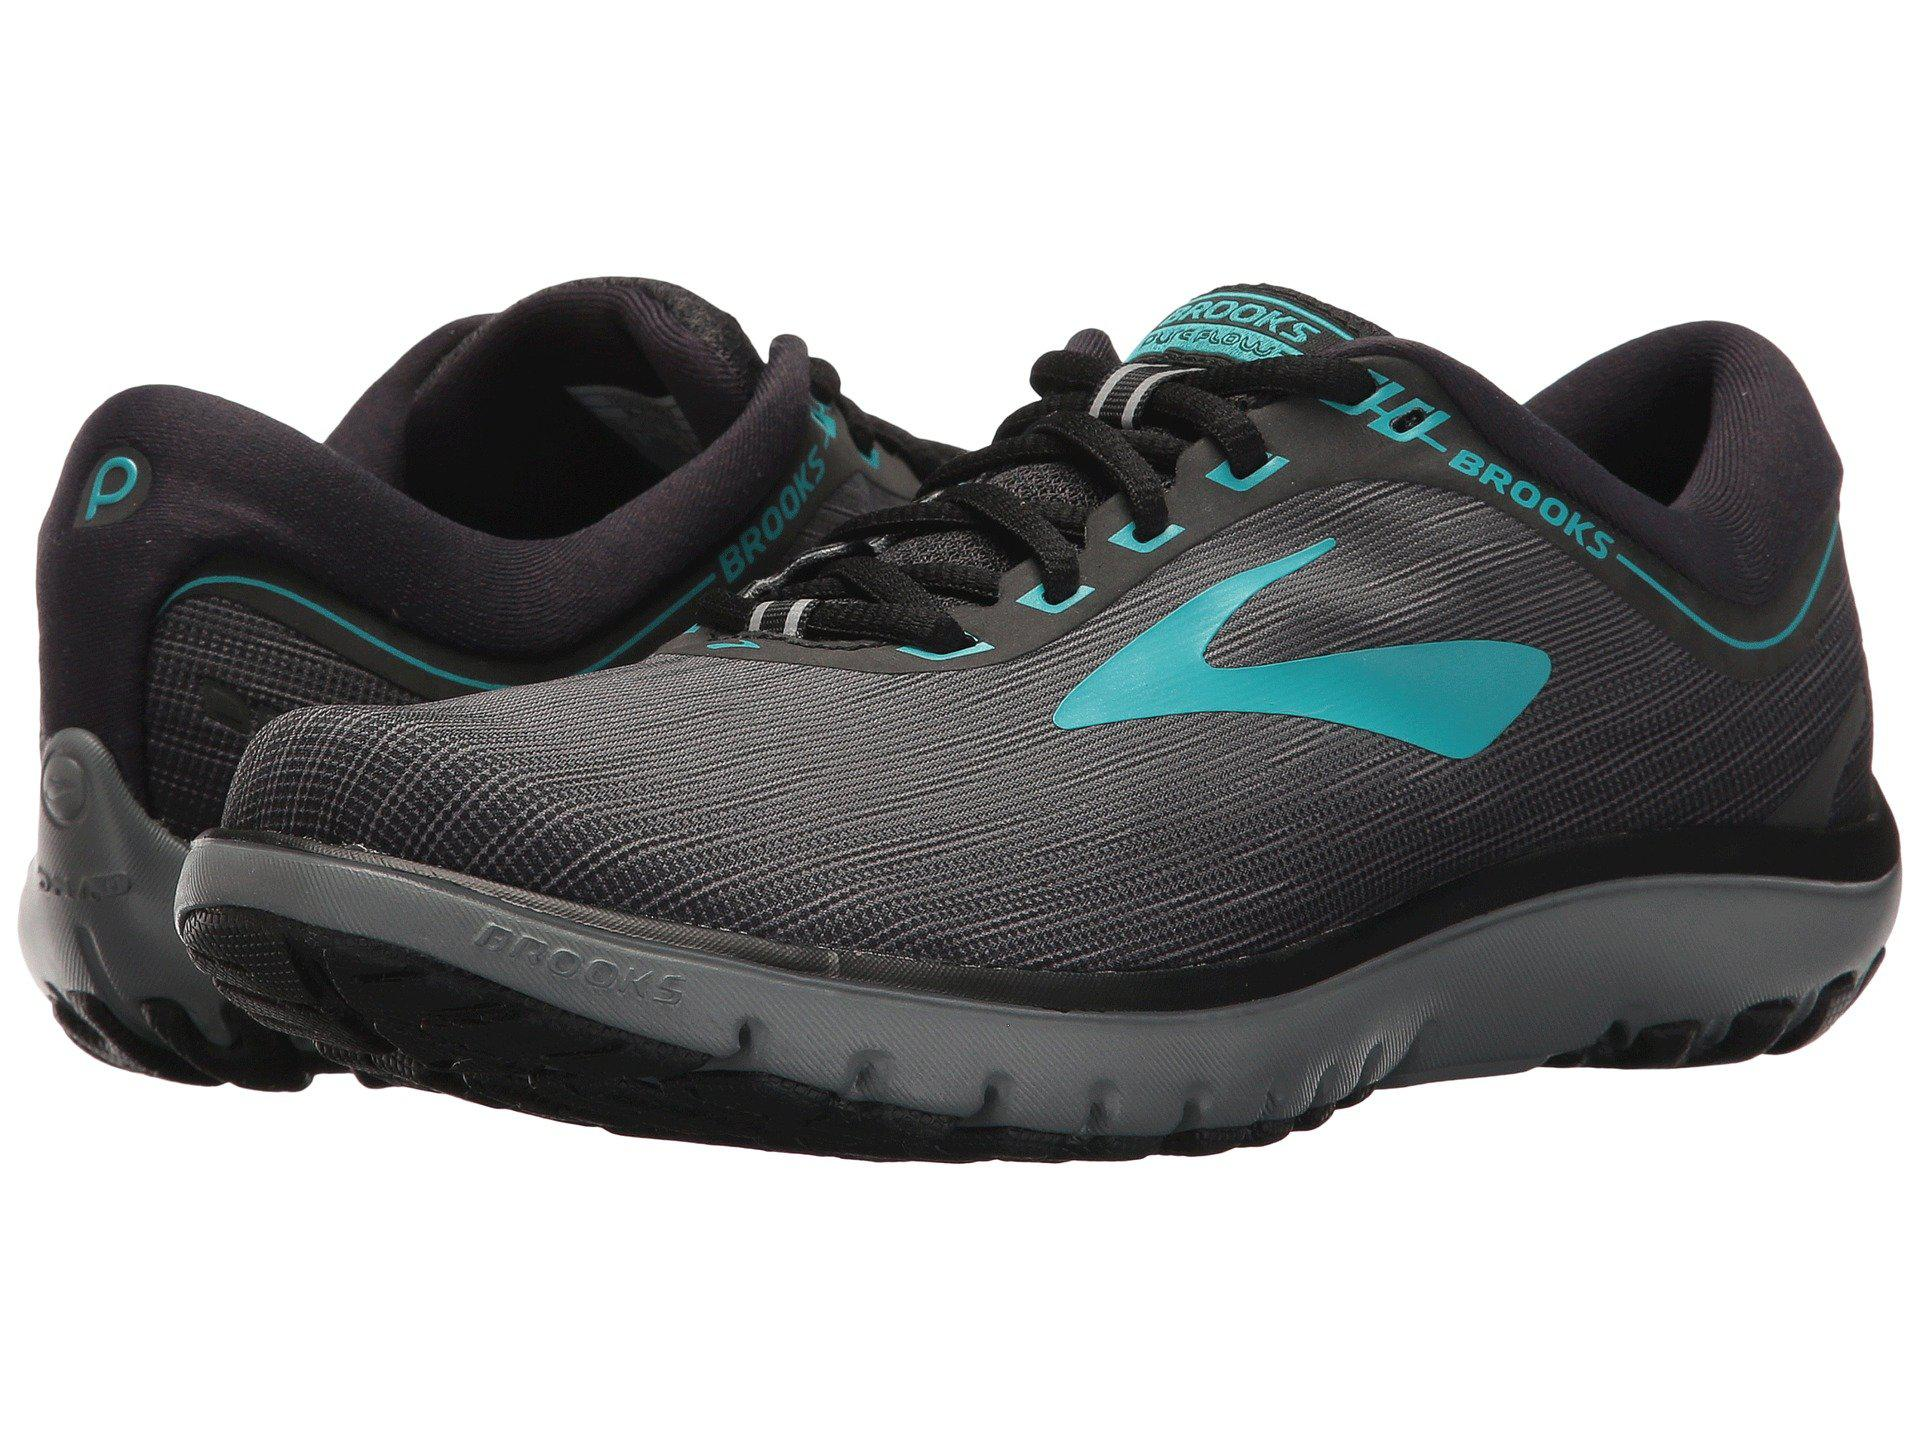 e4cfe95dbfb17 Brooks - Multicolor Pureflow 7 (grey black green) Women s Running Shoes -.  View fullscreen